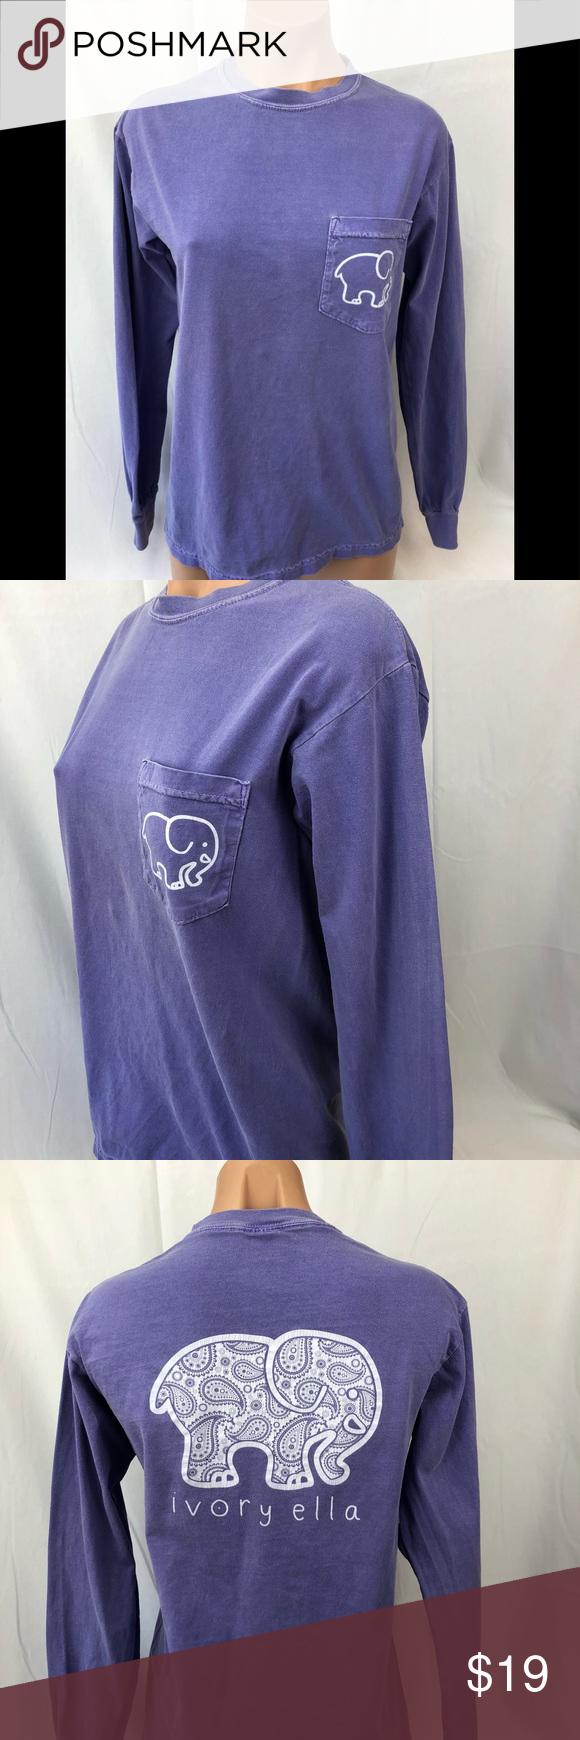 dfc2c9be0 Ivory ella elephant shirt long sleeves purple super cute light purple ivory  ella top with long